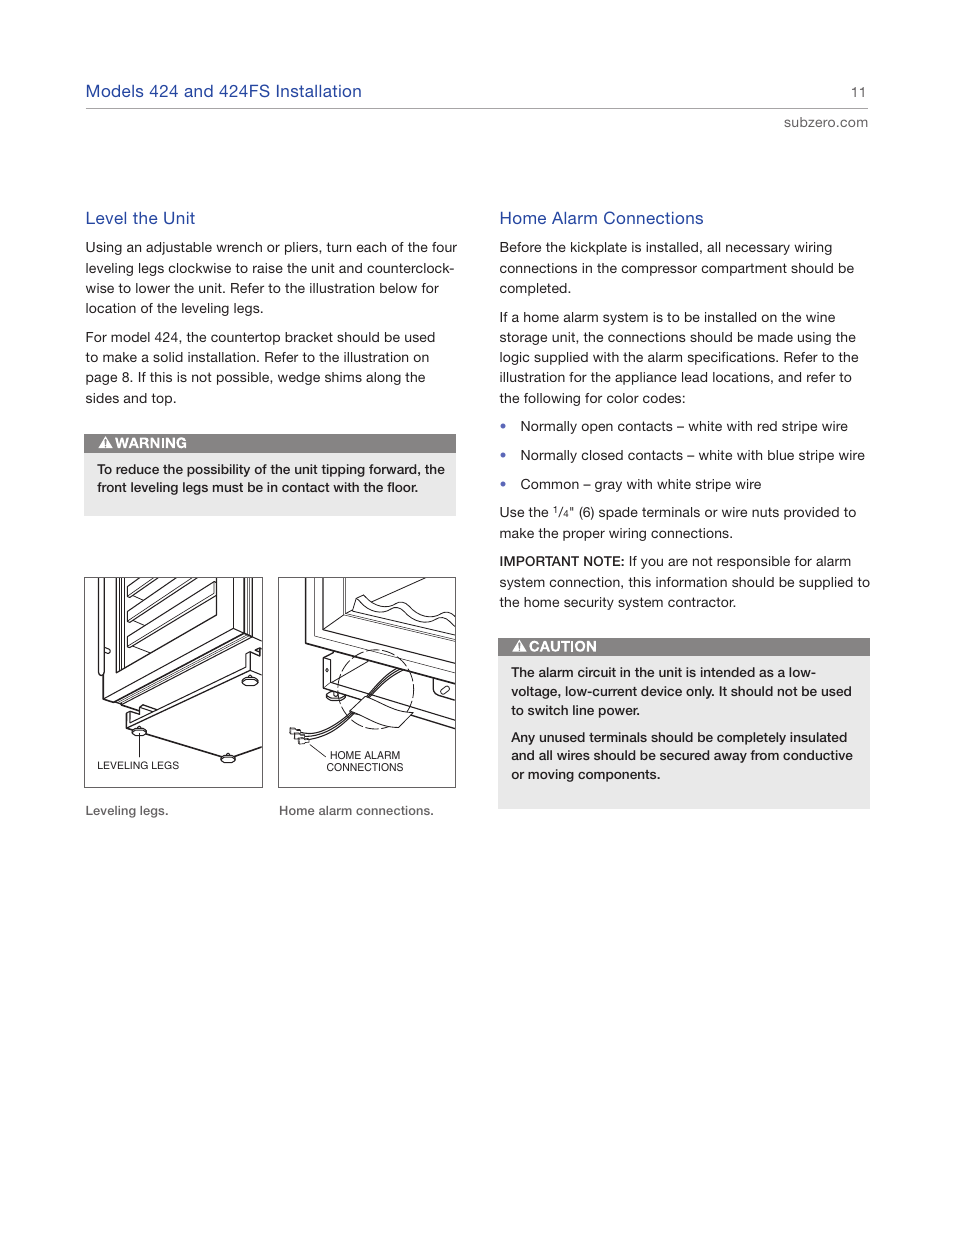 logic 4 alarm system manual